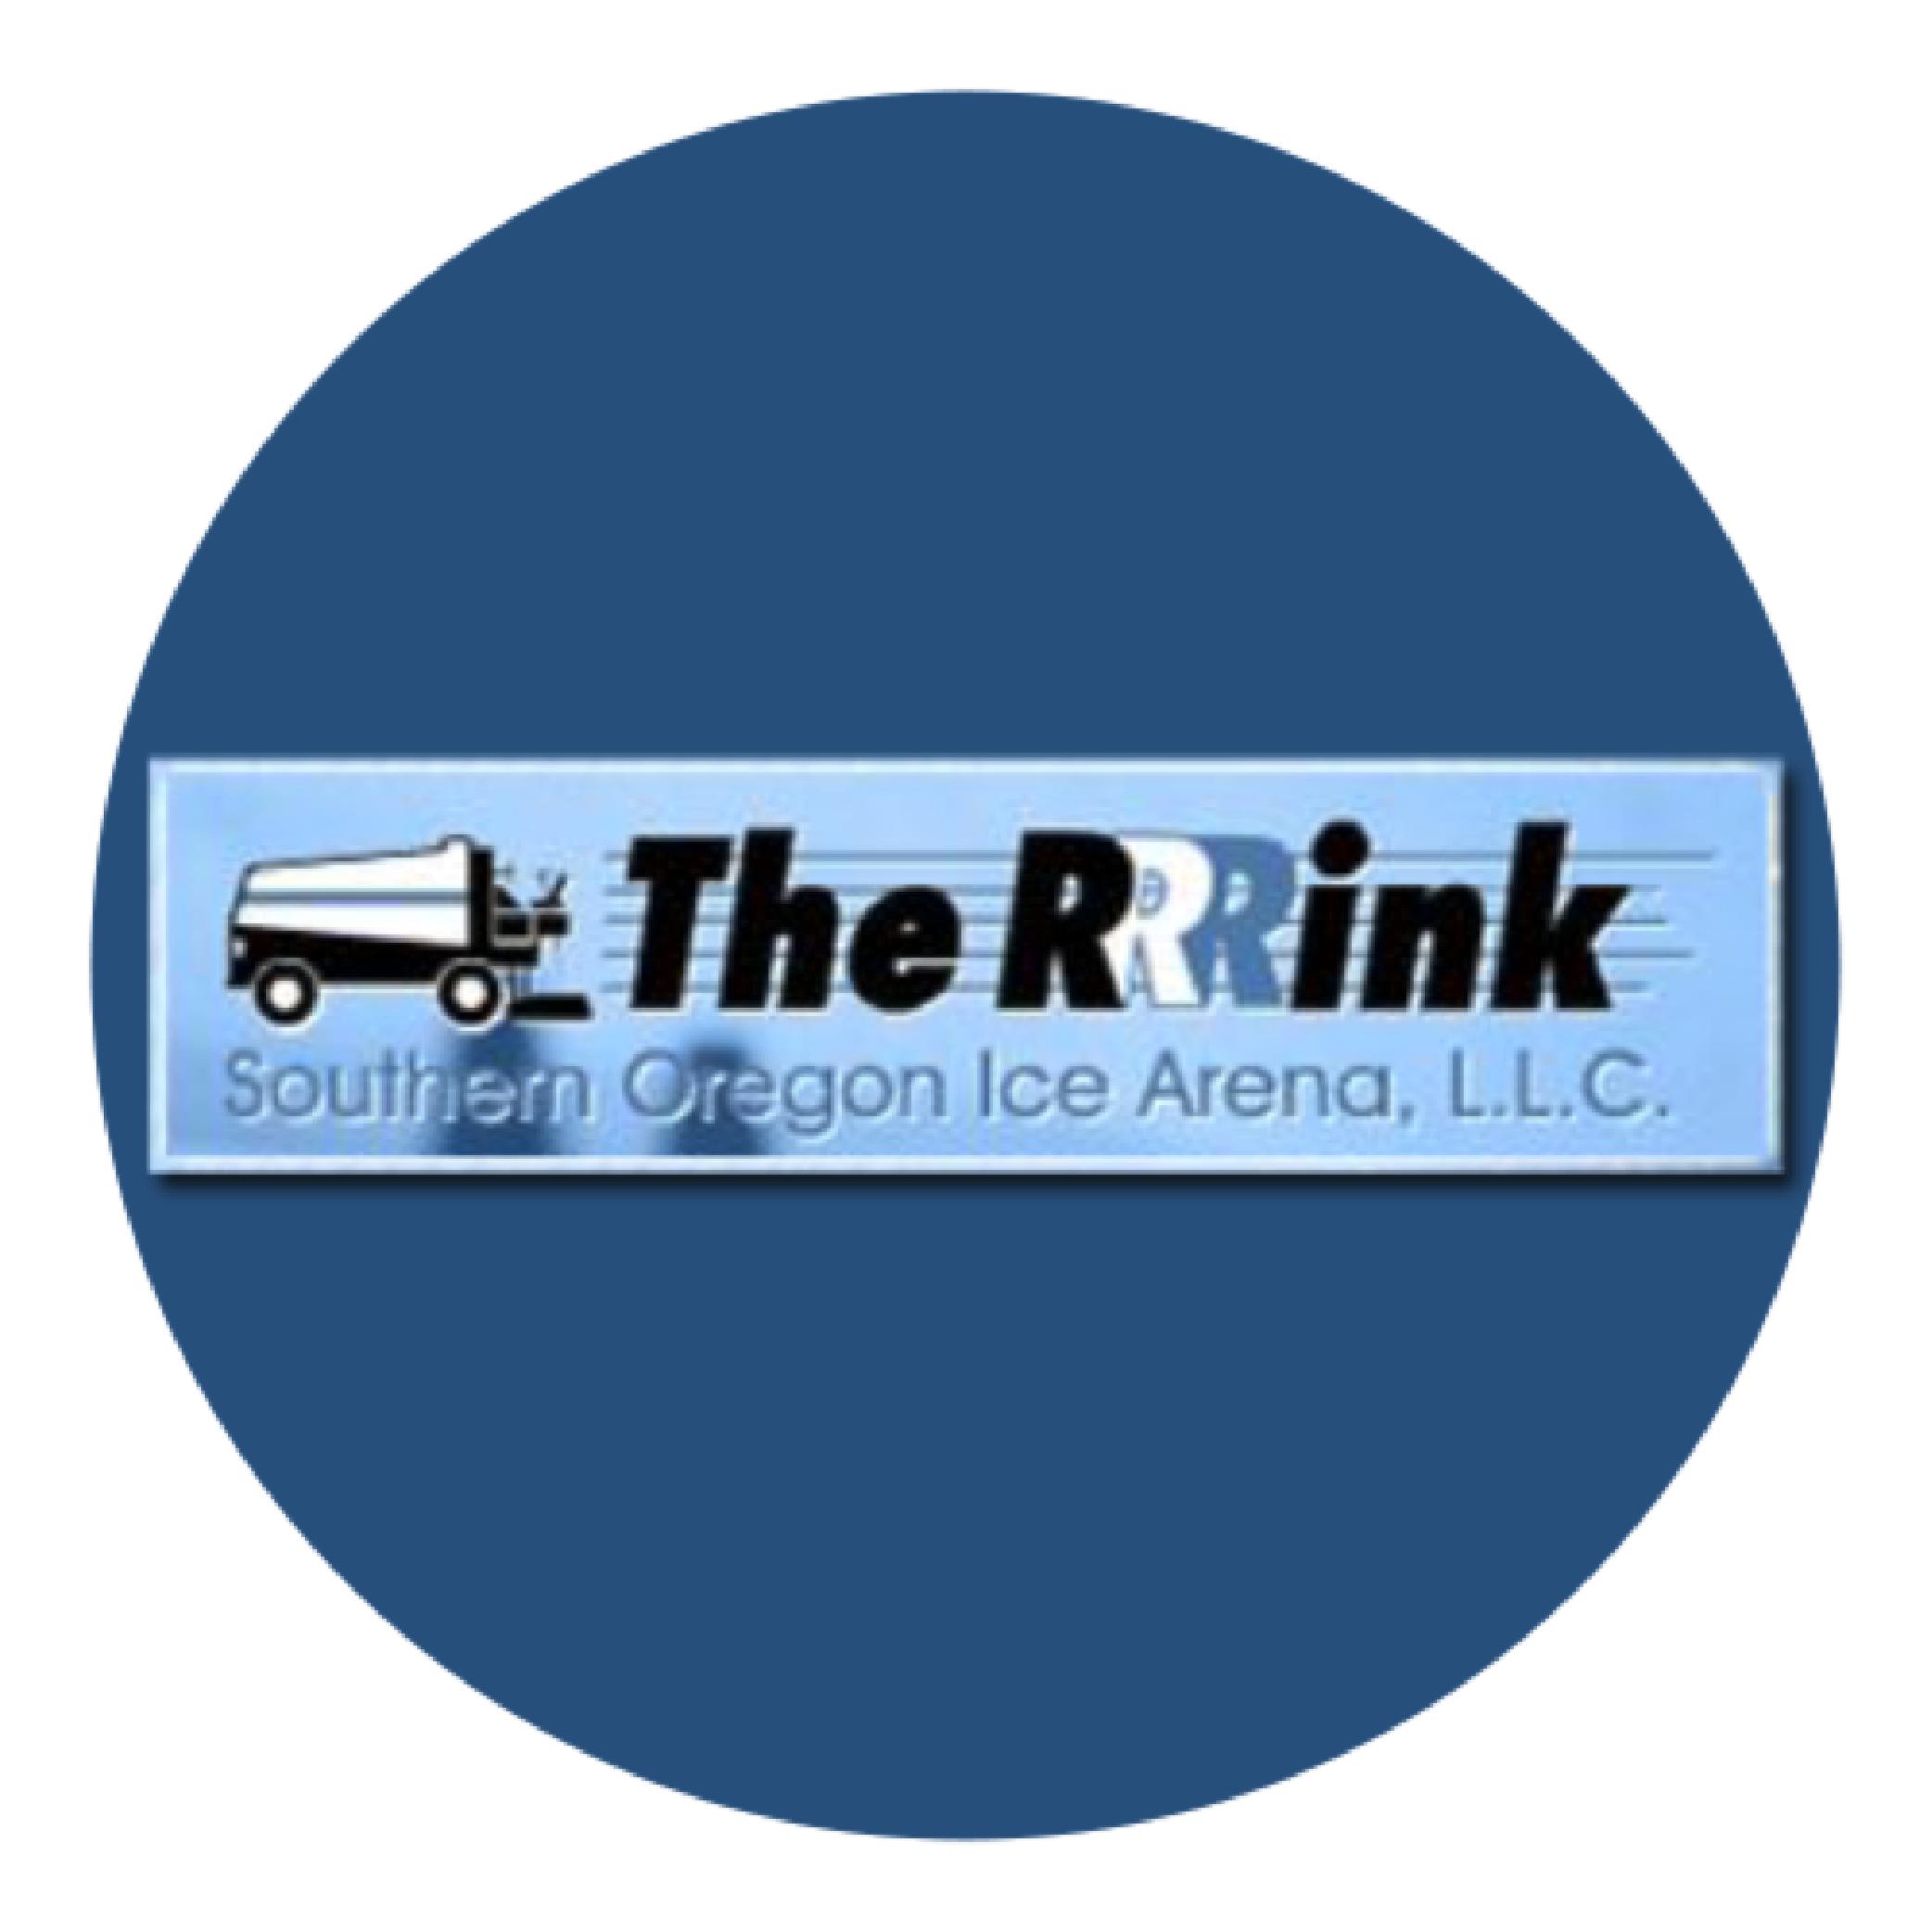 The RRRink